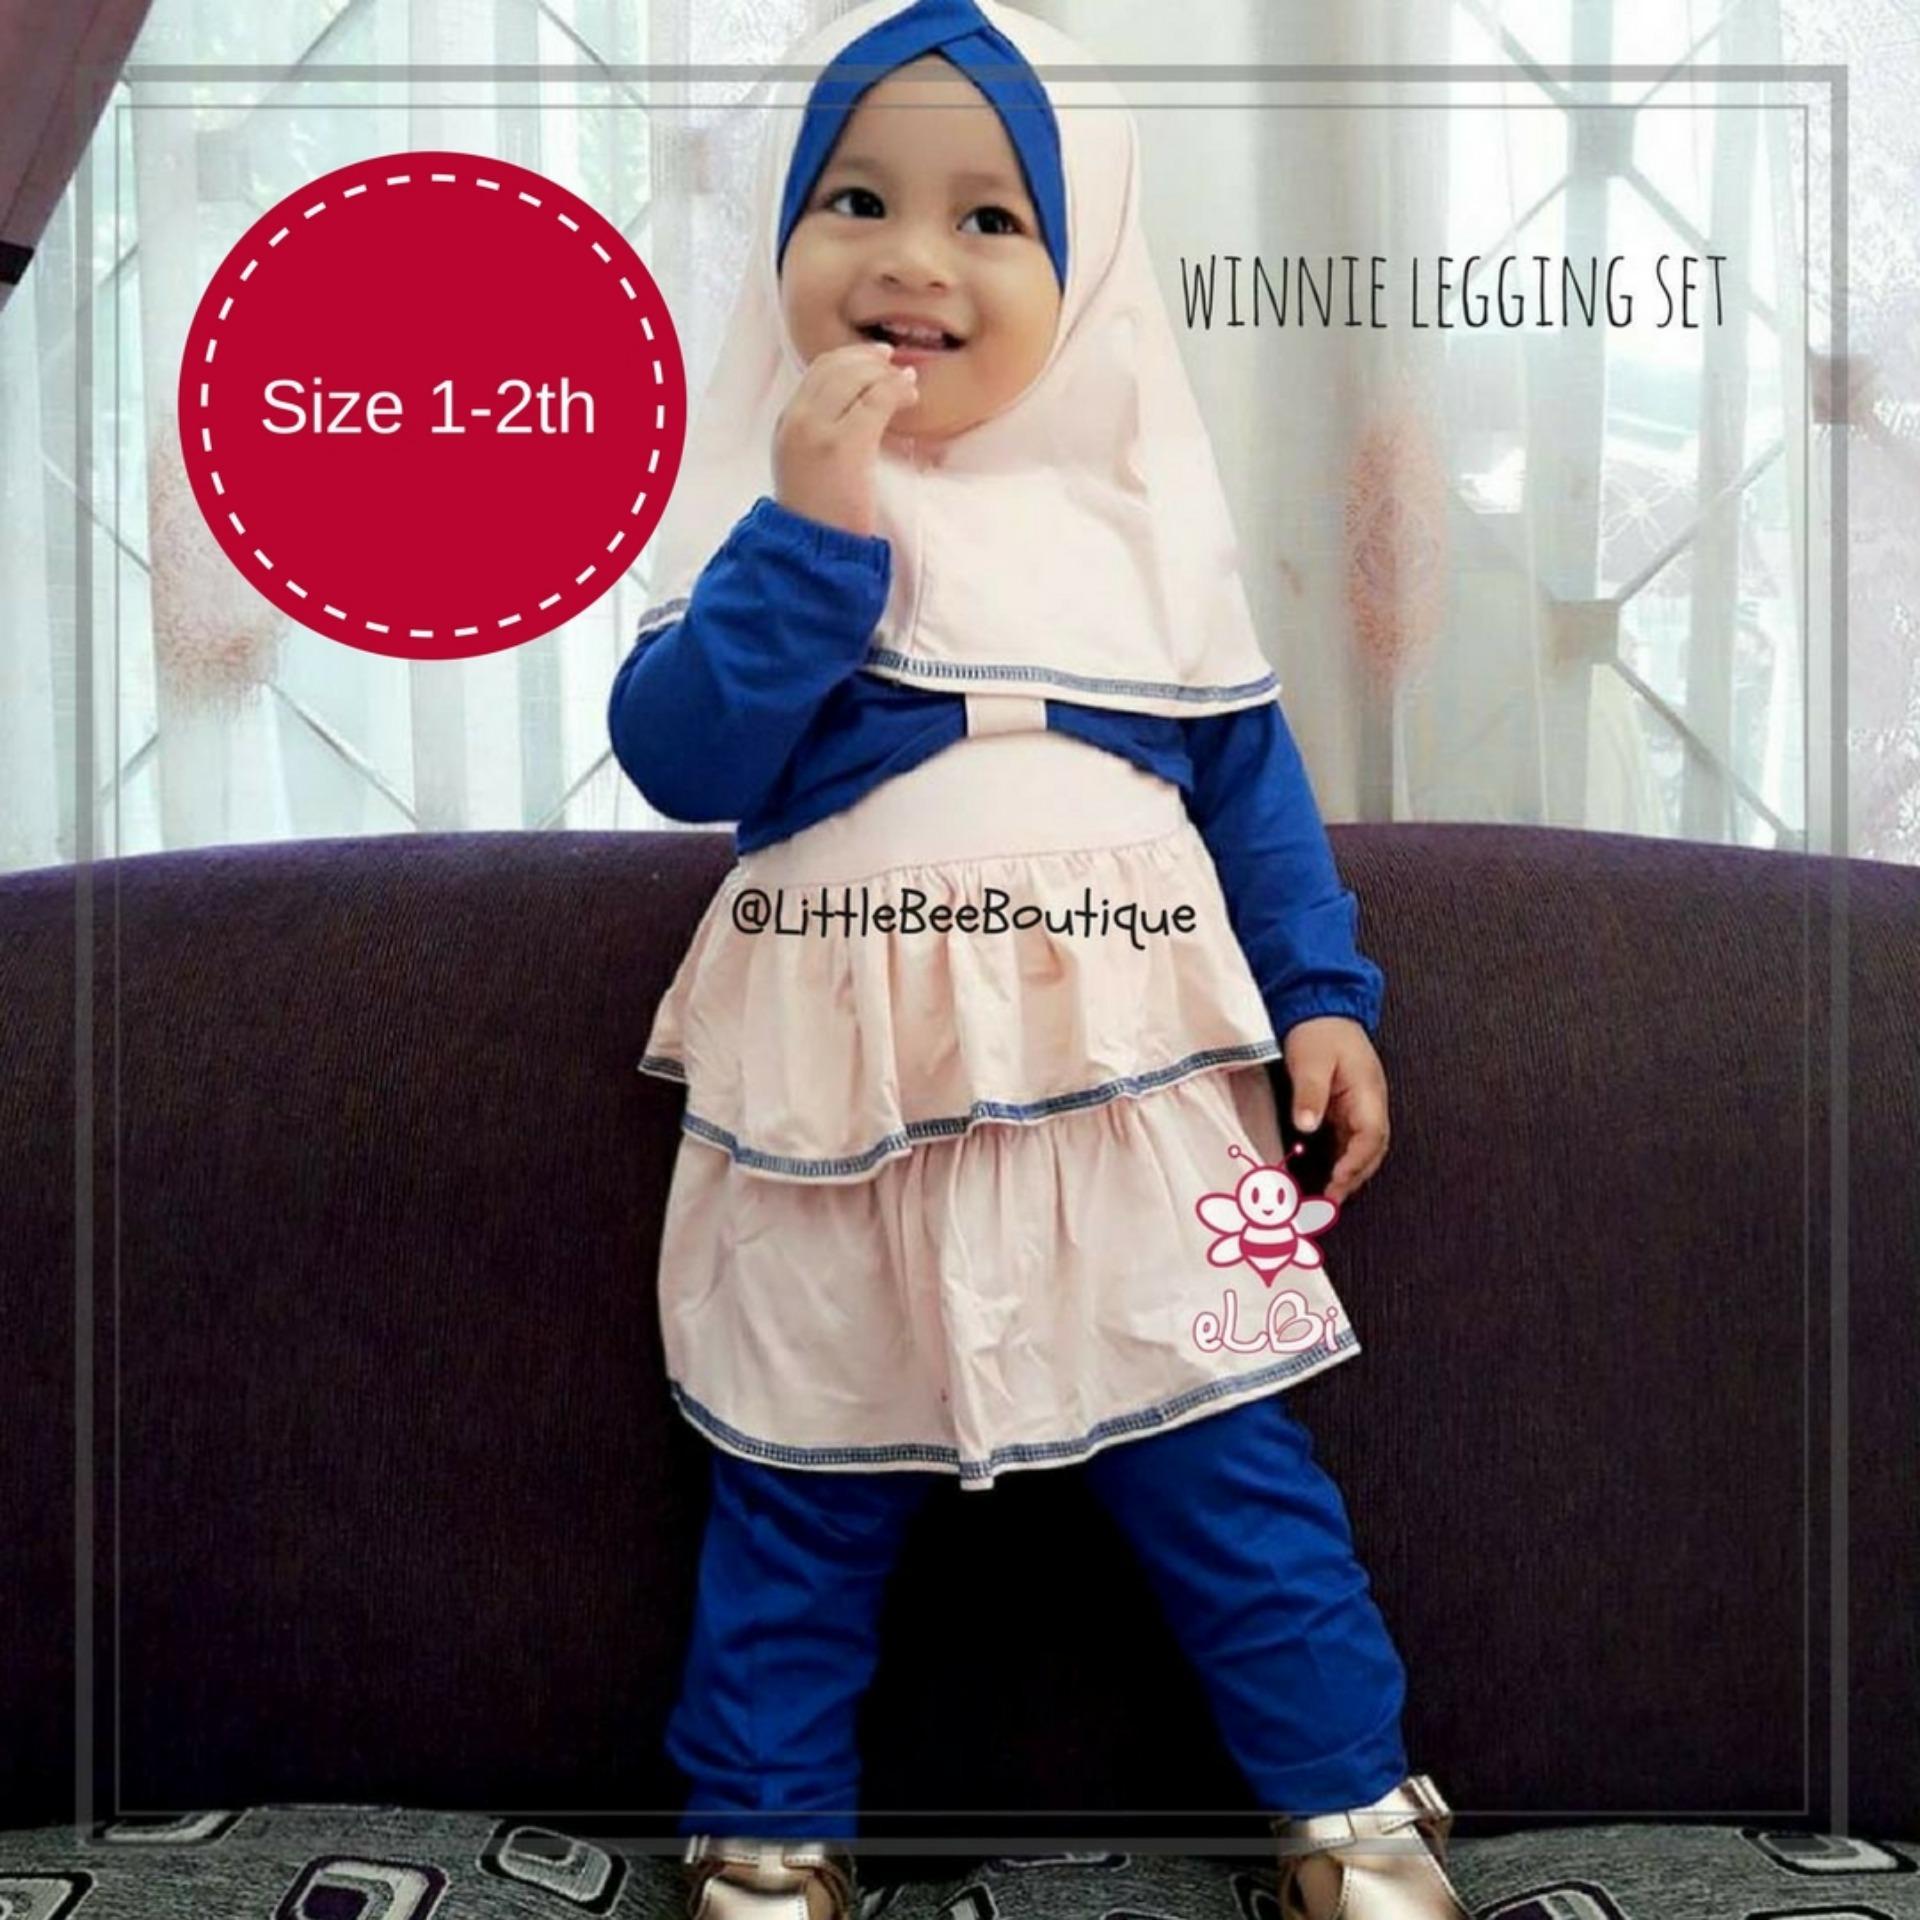 eLBi Winnie Legging Set / Baju Muslim Balita / Setelan Bayi Perempuan / Pakaian Bayi Perempuan / Baju Anak Bayi by Little Bee Boutique